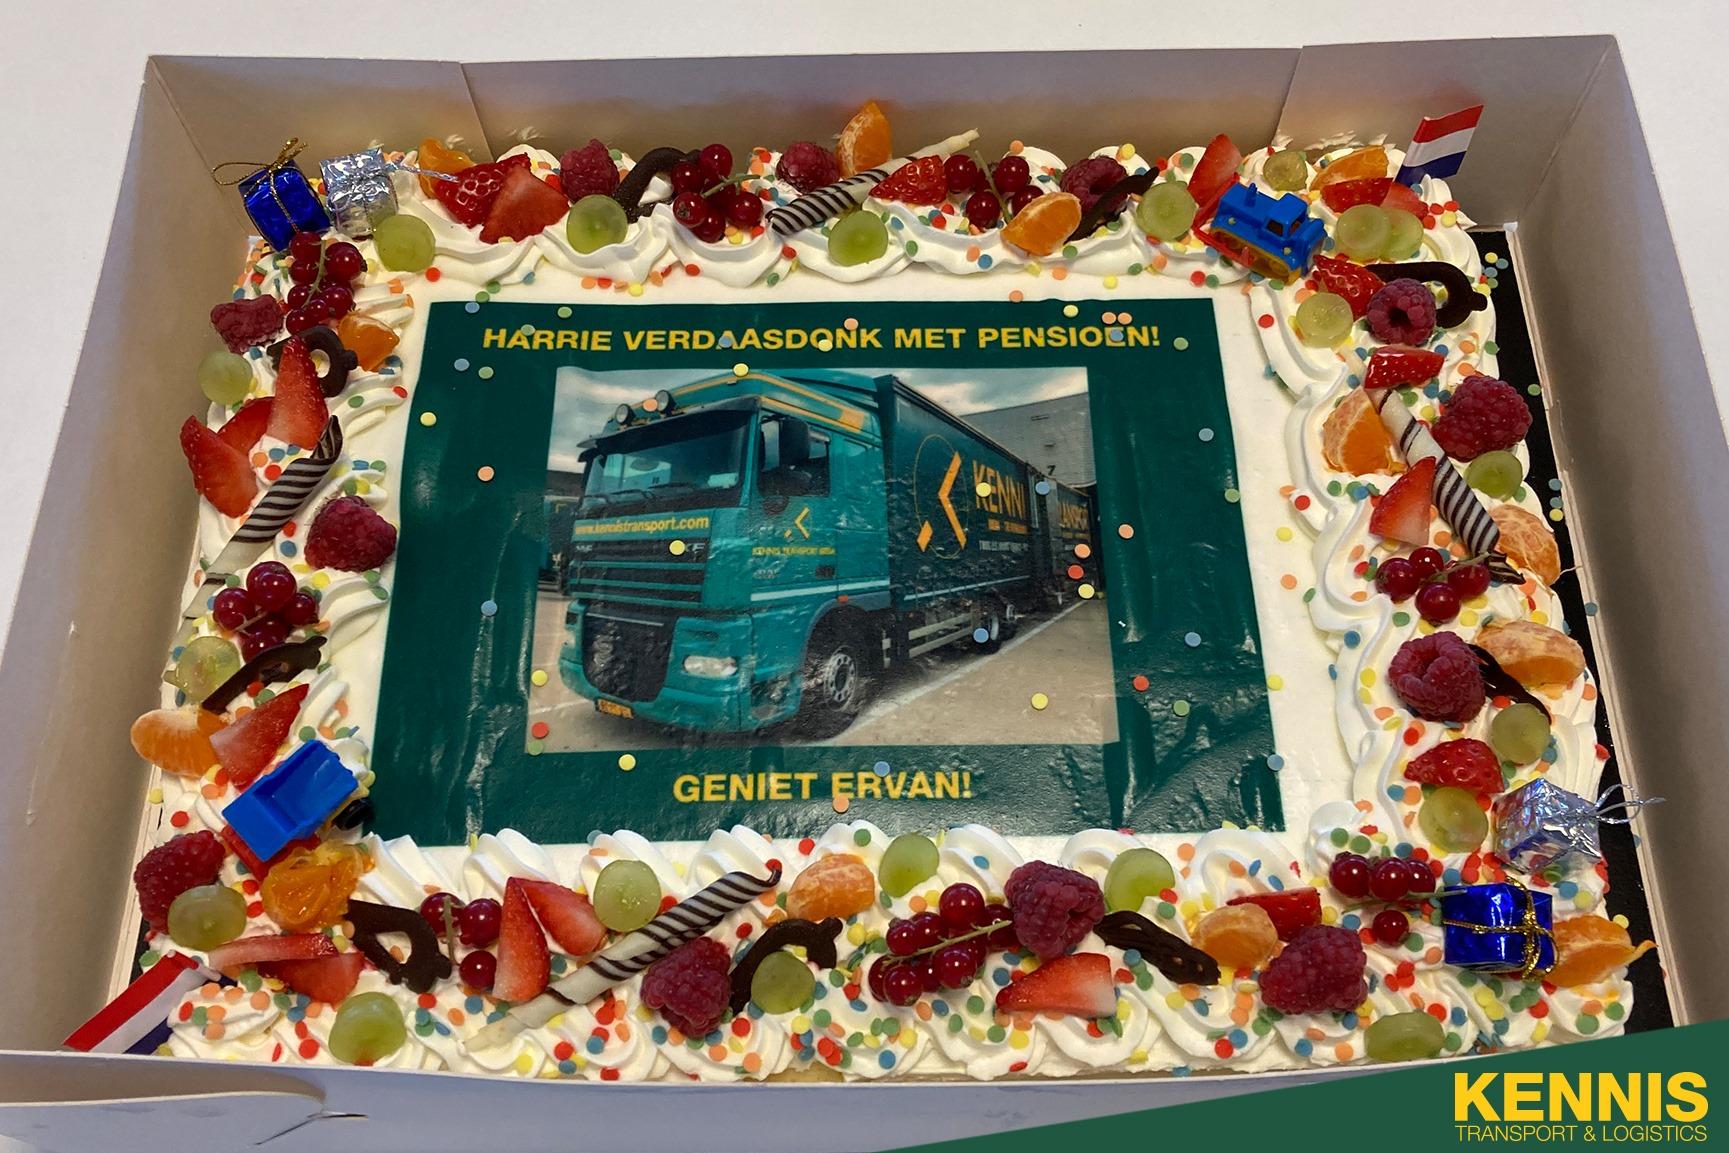 Vandaag-gaat-onze-top-chauffeur-Harrie-Verdaasdonk-met-pensioen-na-34-jaar--16-1-2020---(1)